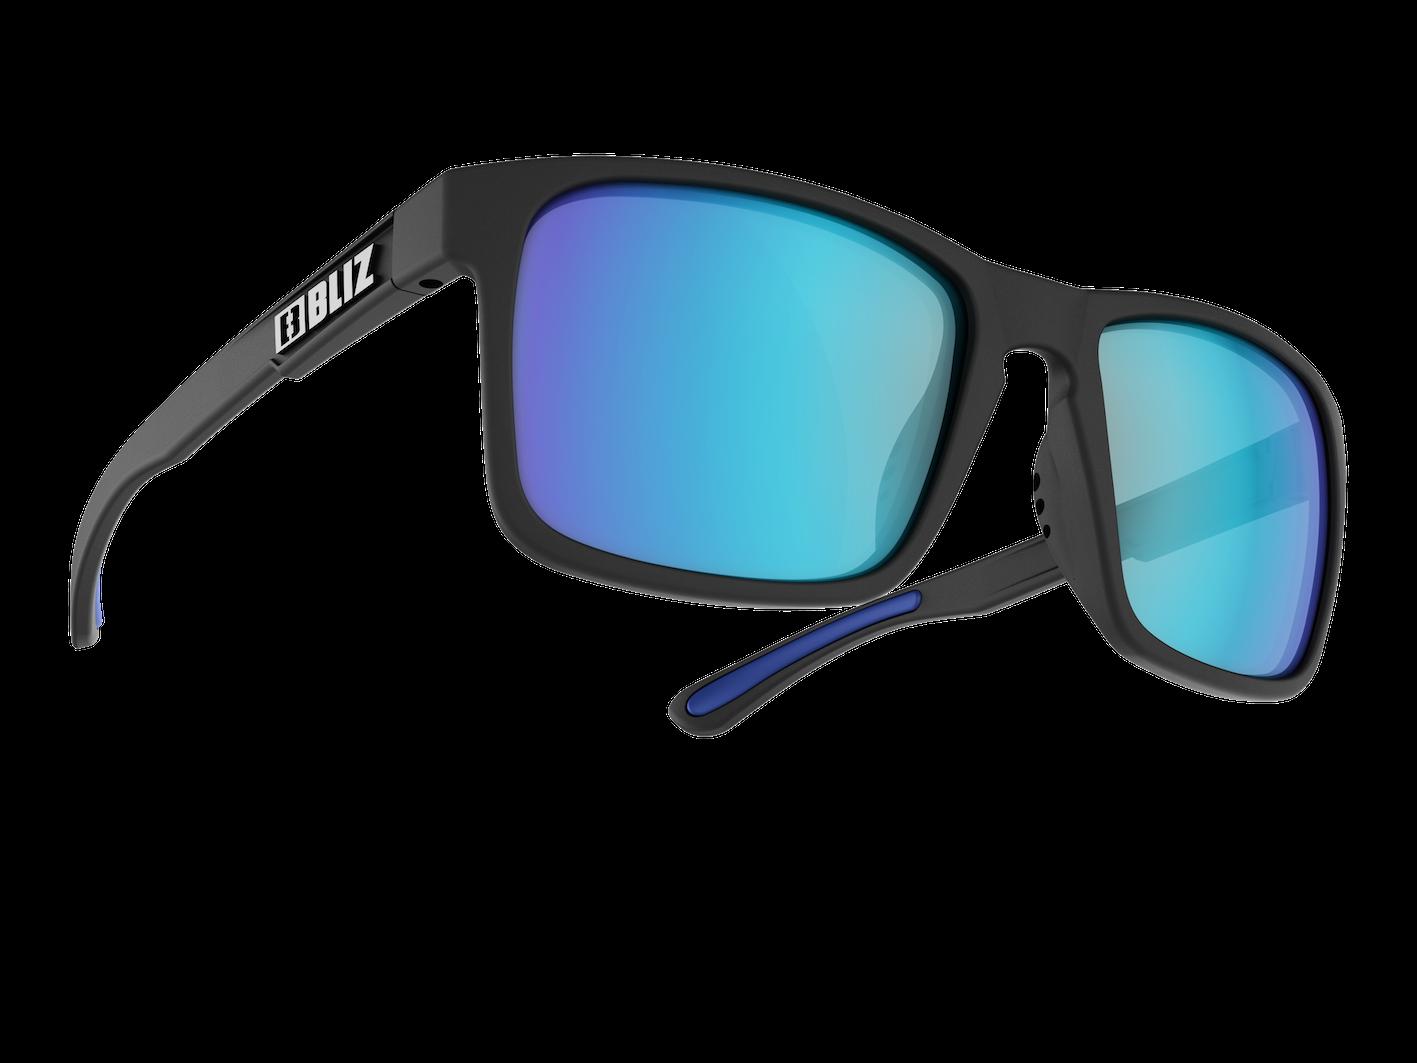 Bliz 2020 Sunglasses